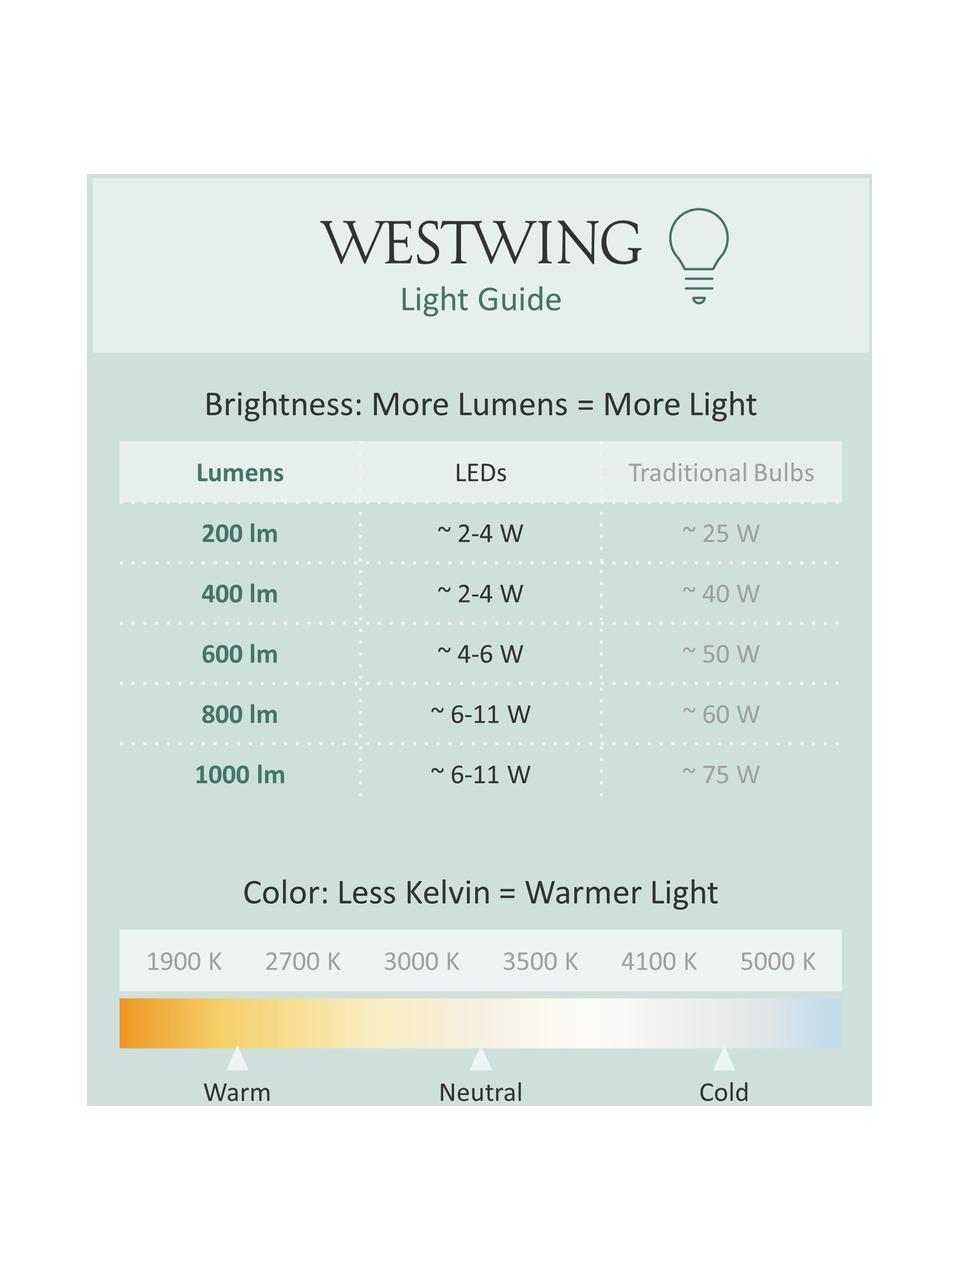 Lampadina E27, 806lm, dimmerabile, bianco caldo 3 pz, Paralume: materiale sintetico, Base lampadina: alluminio, Bianco, Ø 6 x Alt. 10 cm